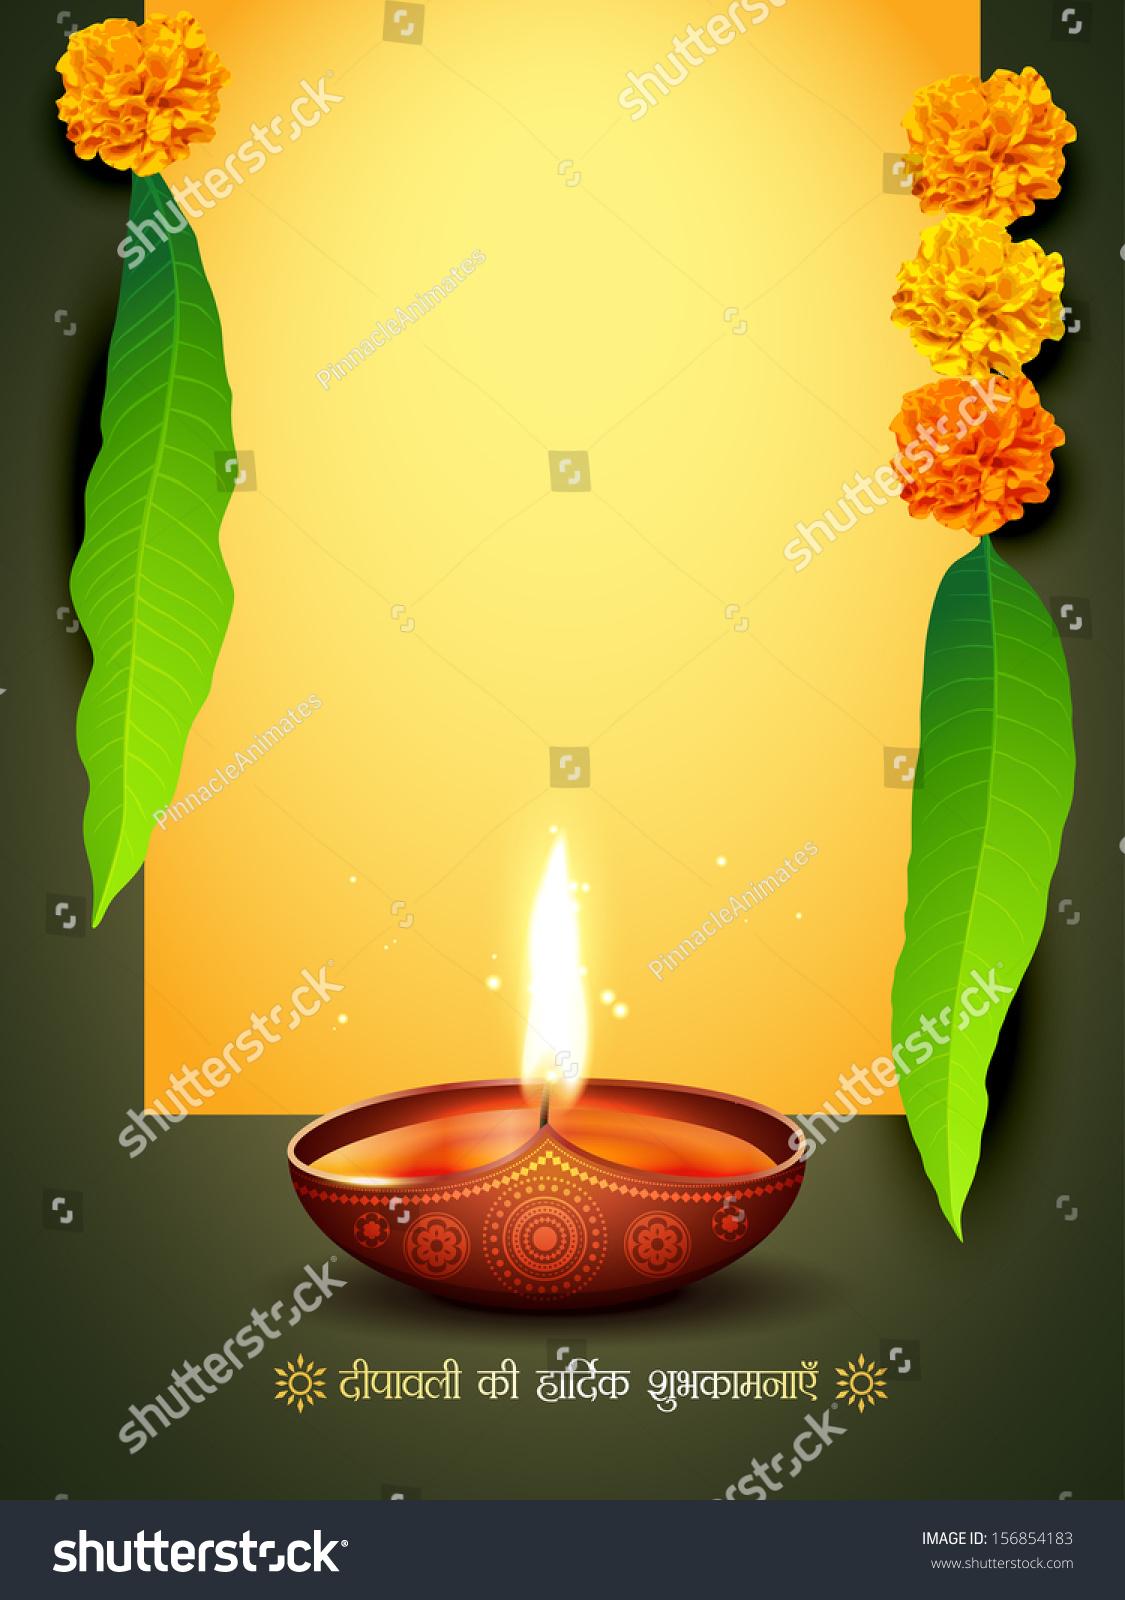 Vector Diwali Ki Hardik Shubhkamnaye (translation Diwali